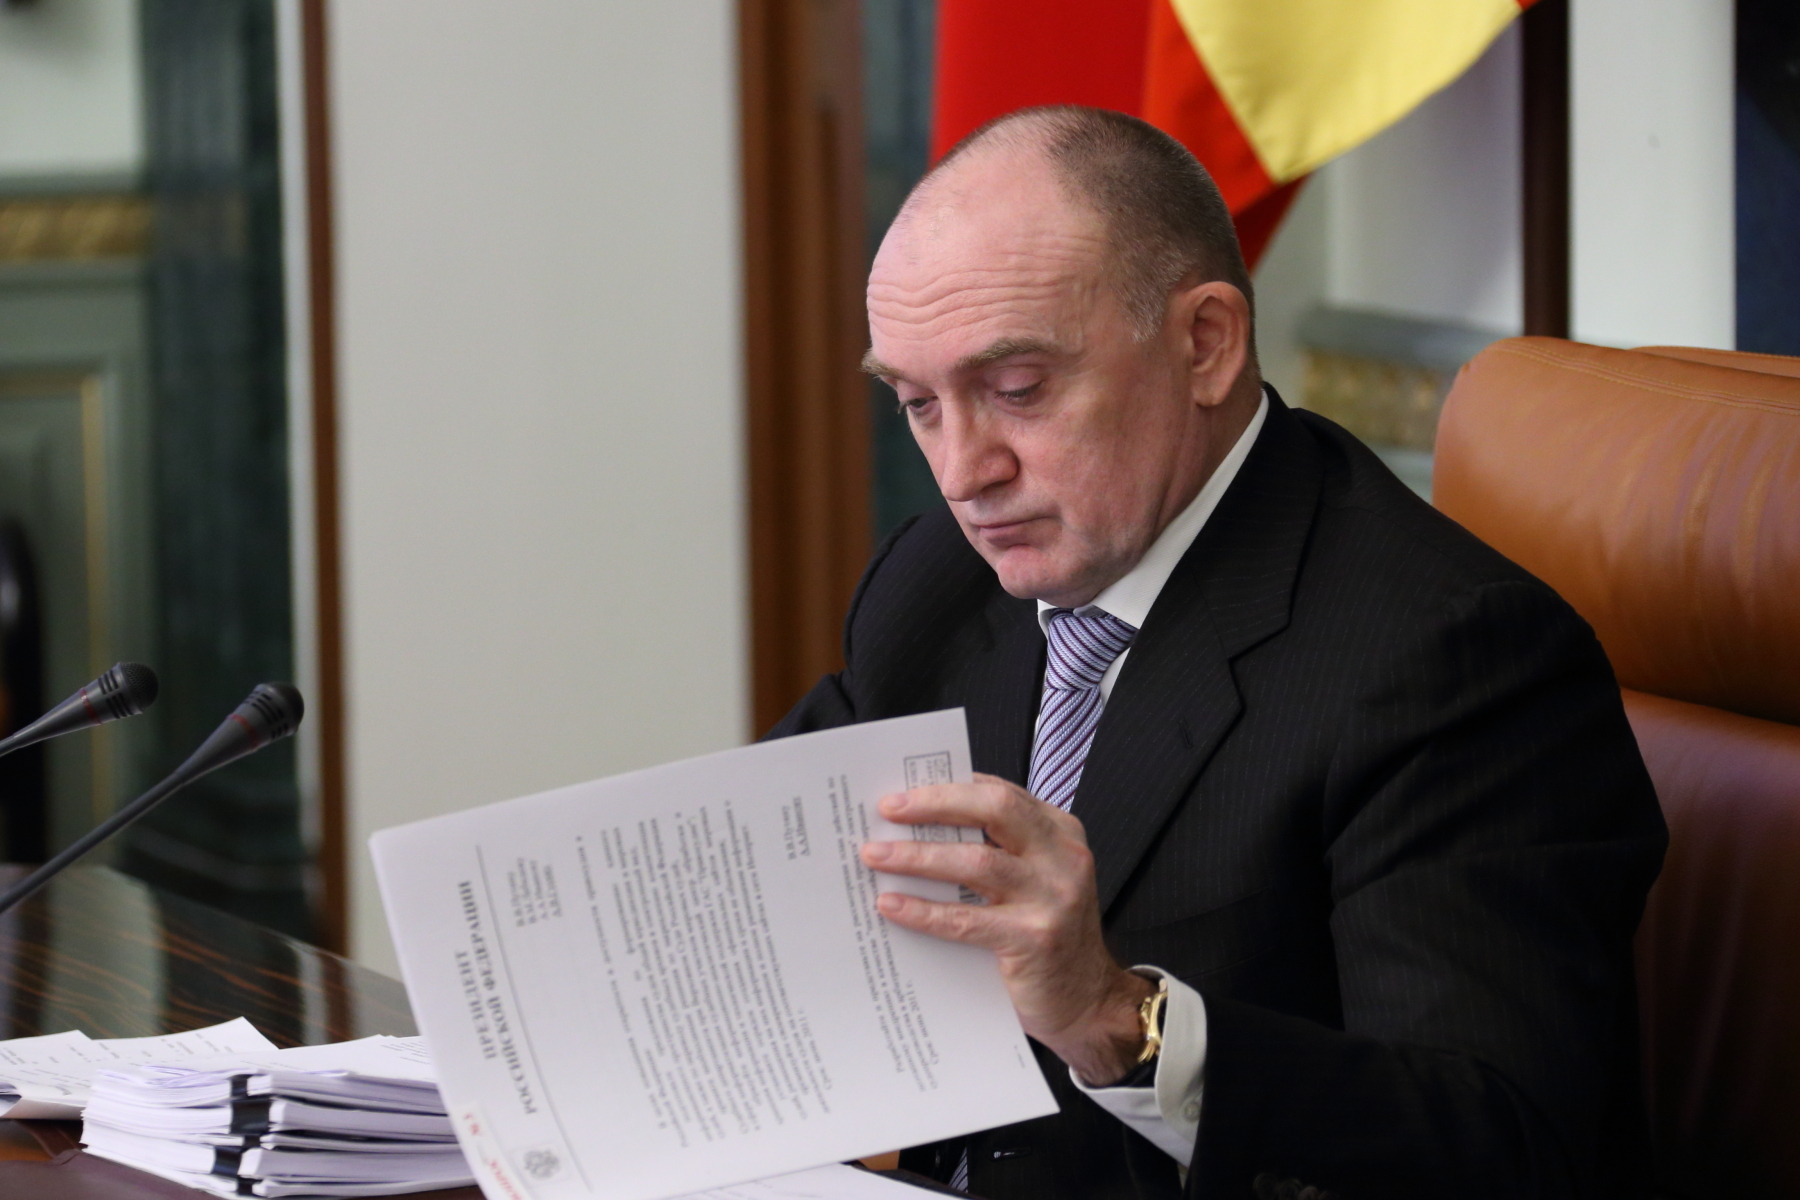 Руководство Челябинской области одобрило проект бюджета натри года